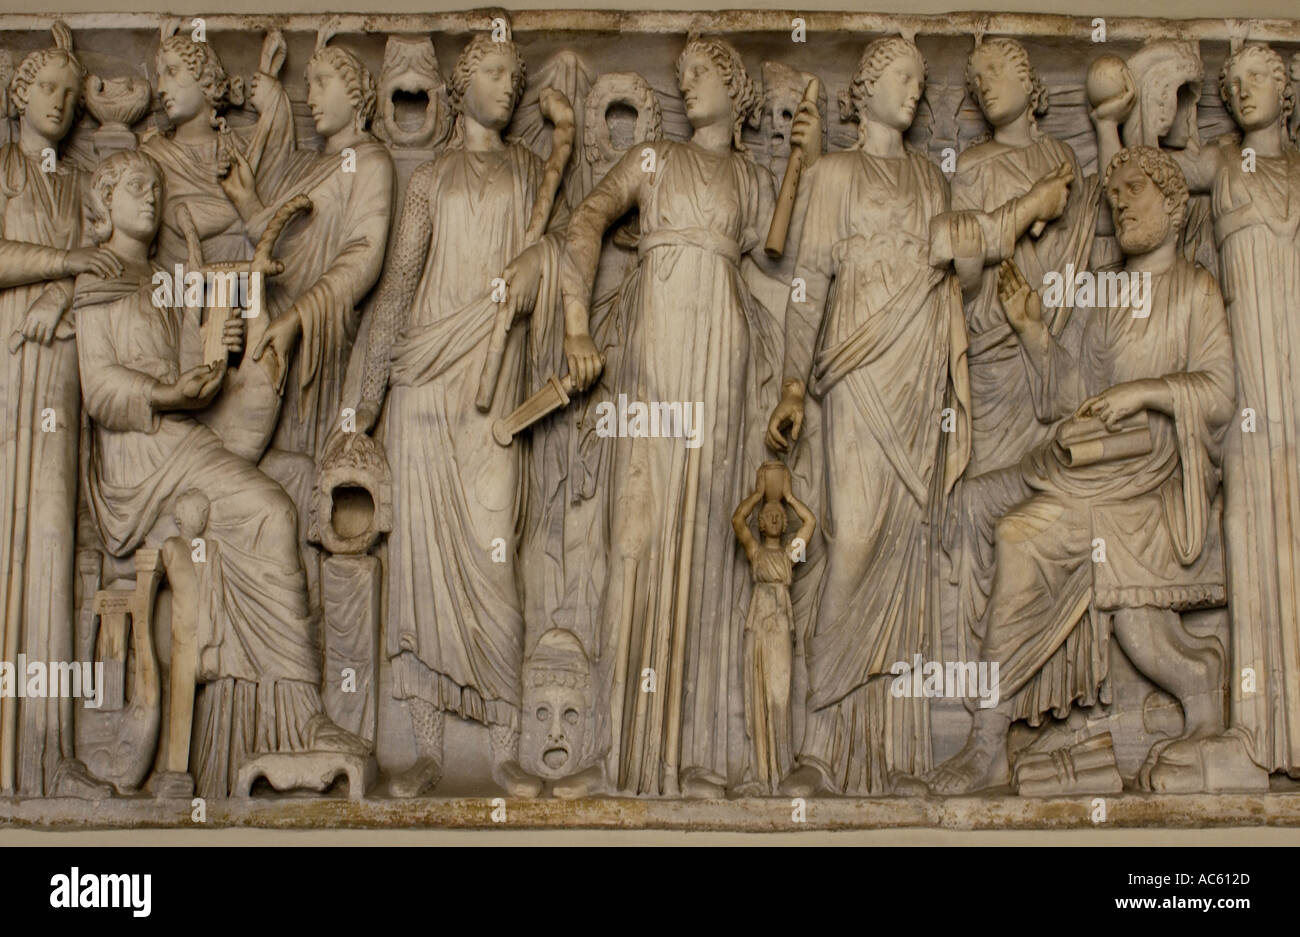 Roman artwork at the Roman Forum in Rome, Italy - Stock Image